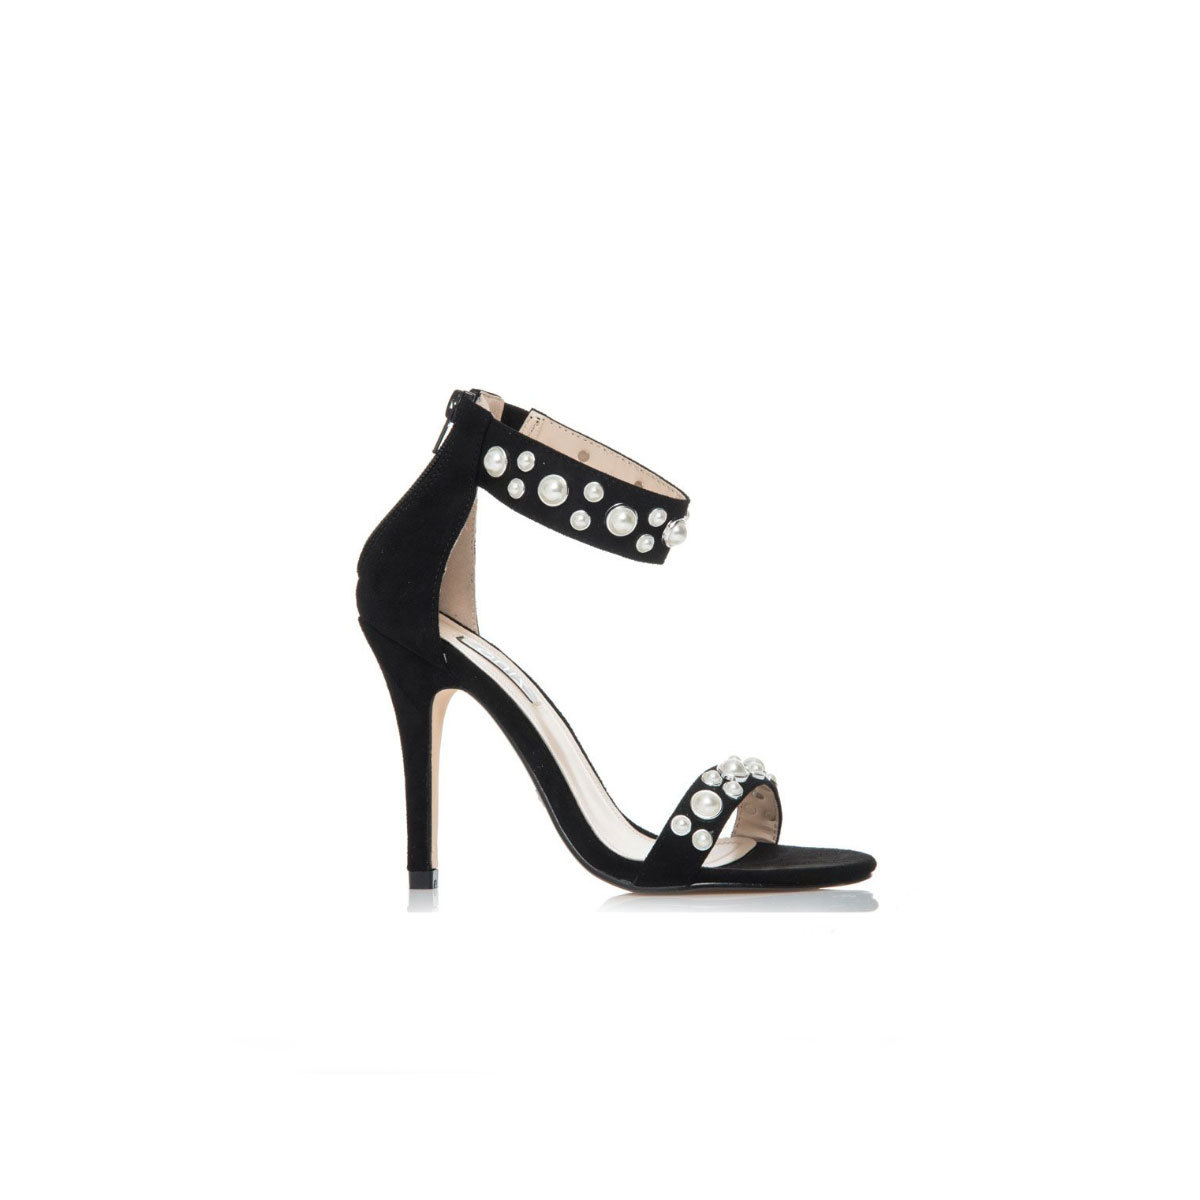 Sandalias de tacón negras con perlas, de Quiz (17,99 euros).